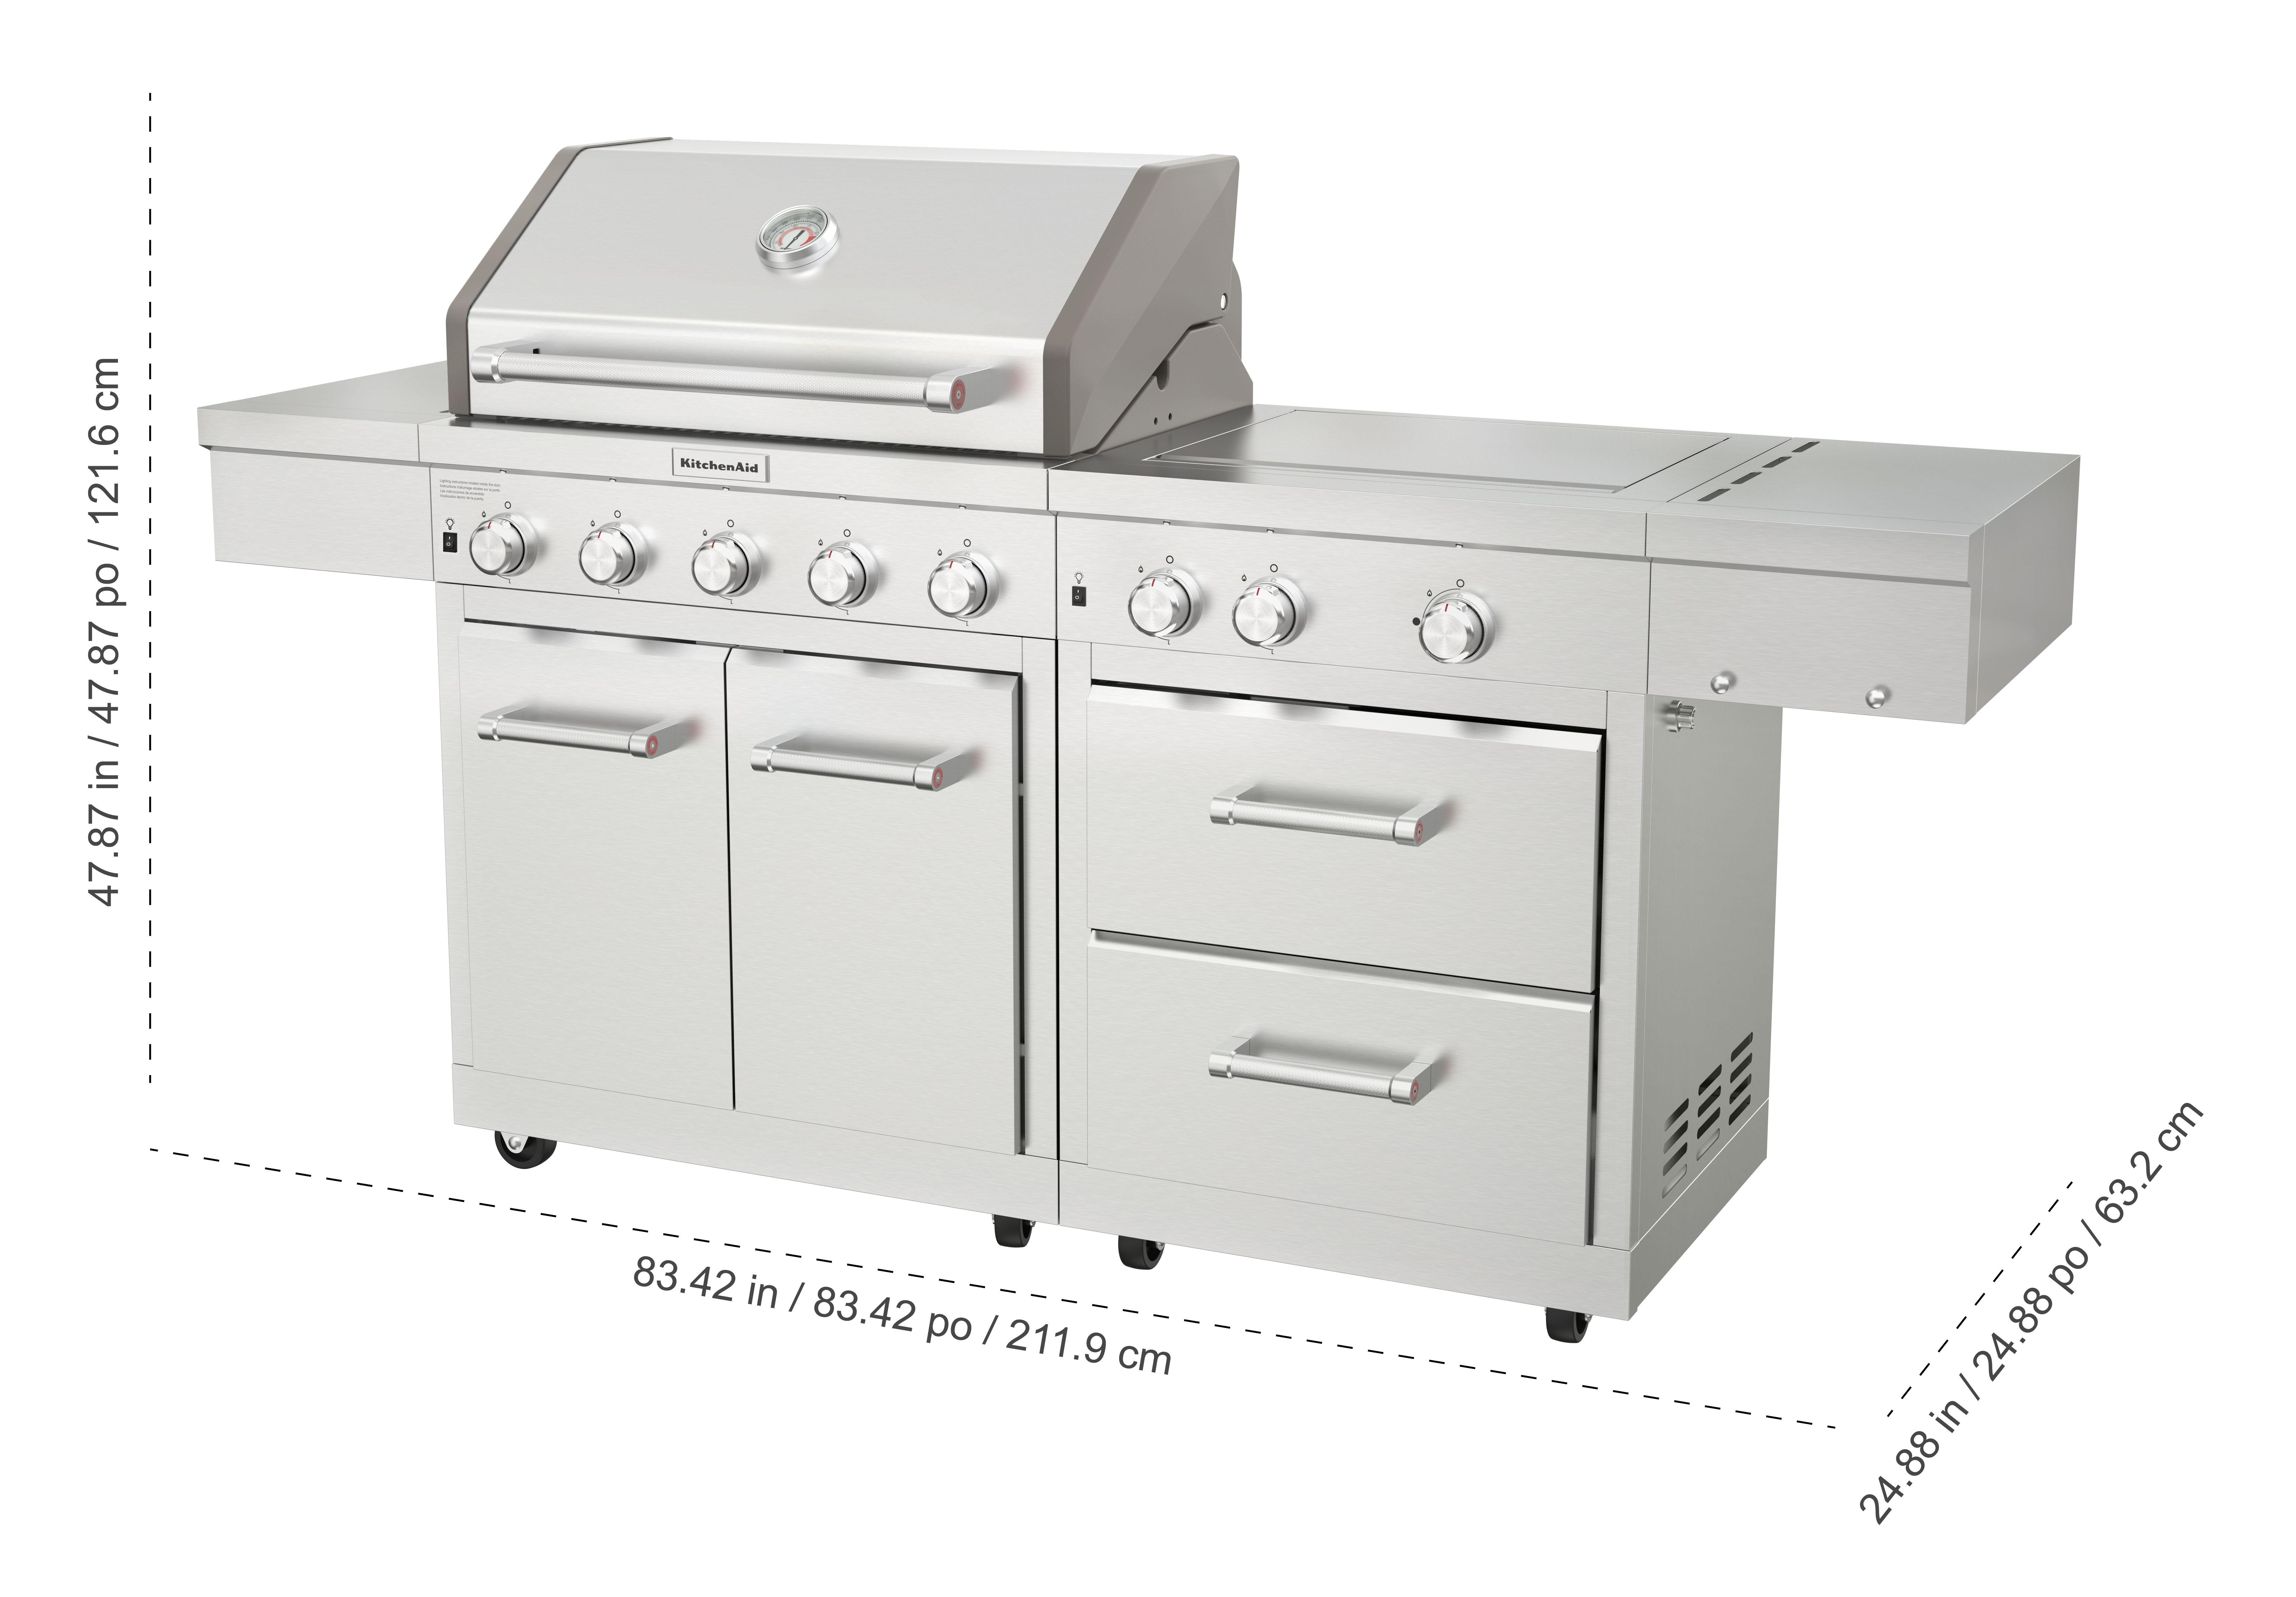 KitchenAid Stainless Steel 8-Burner Grill